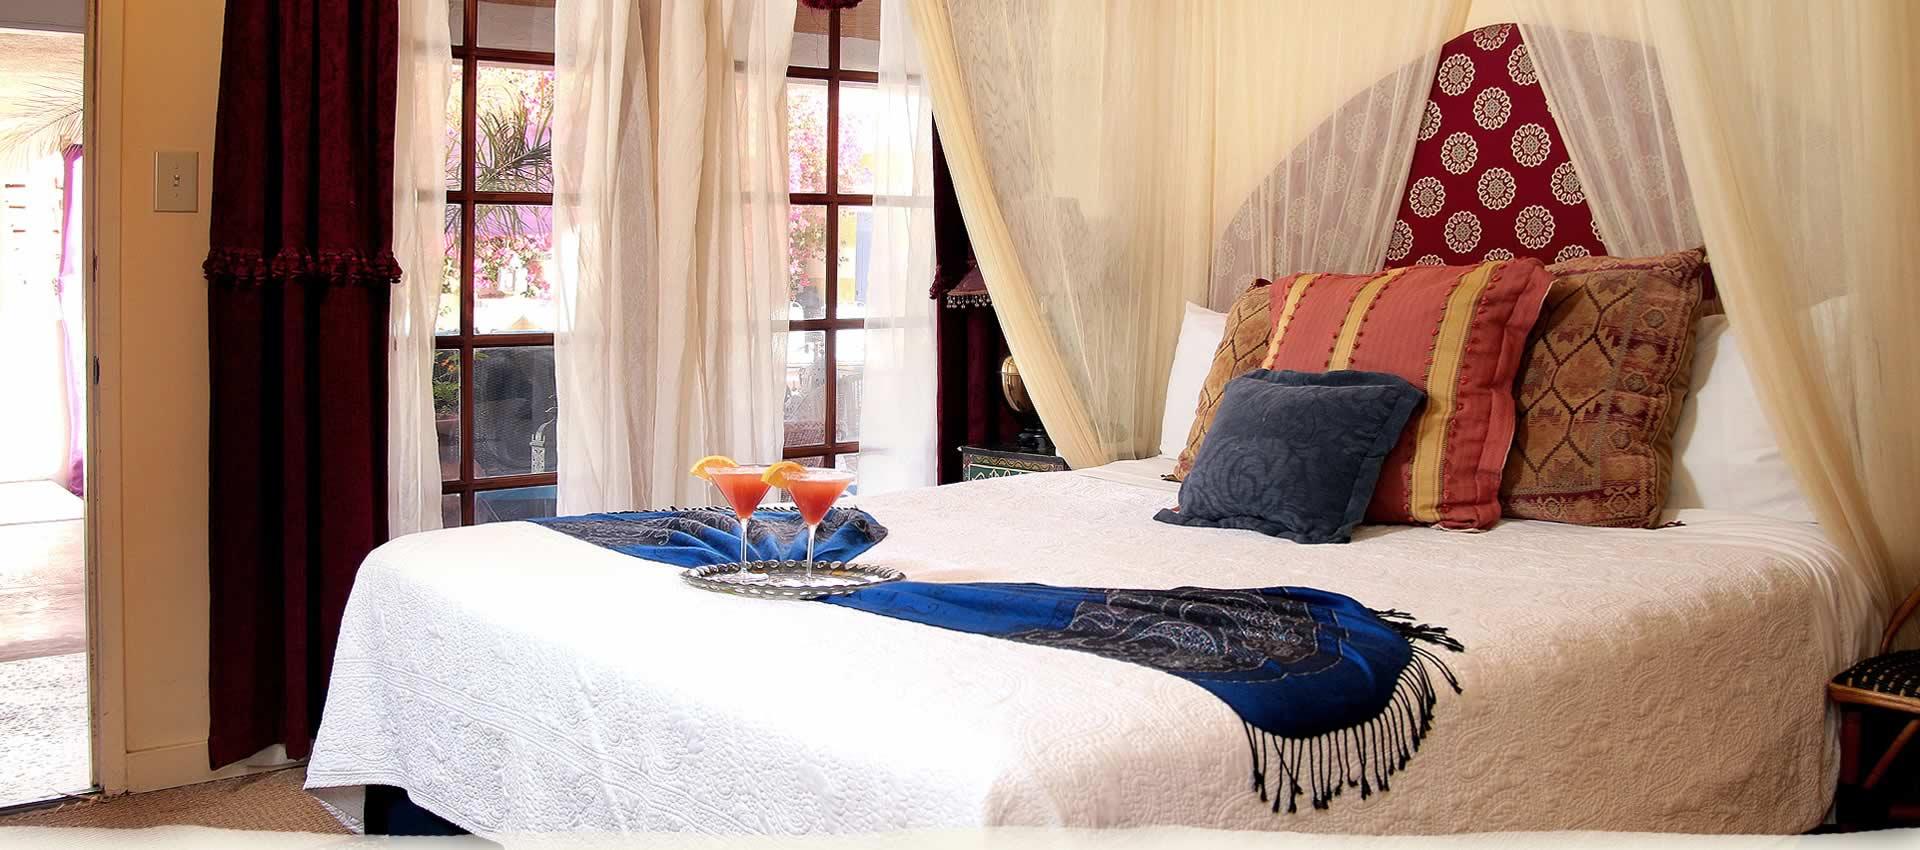 El-Morocco-Inn-standard-king